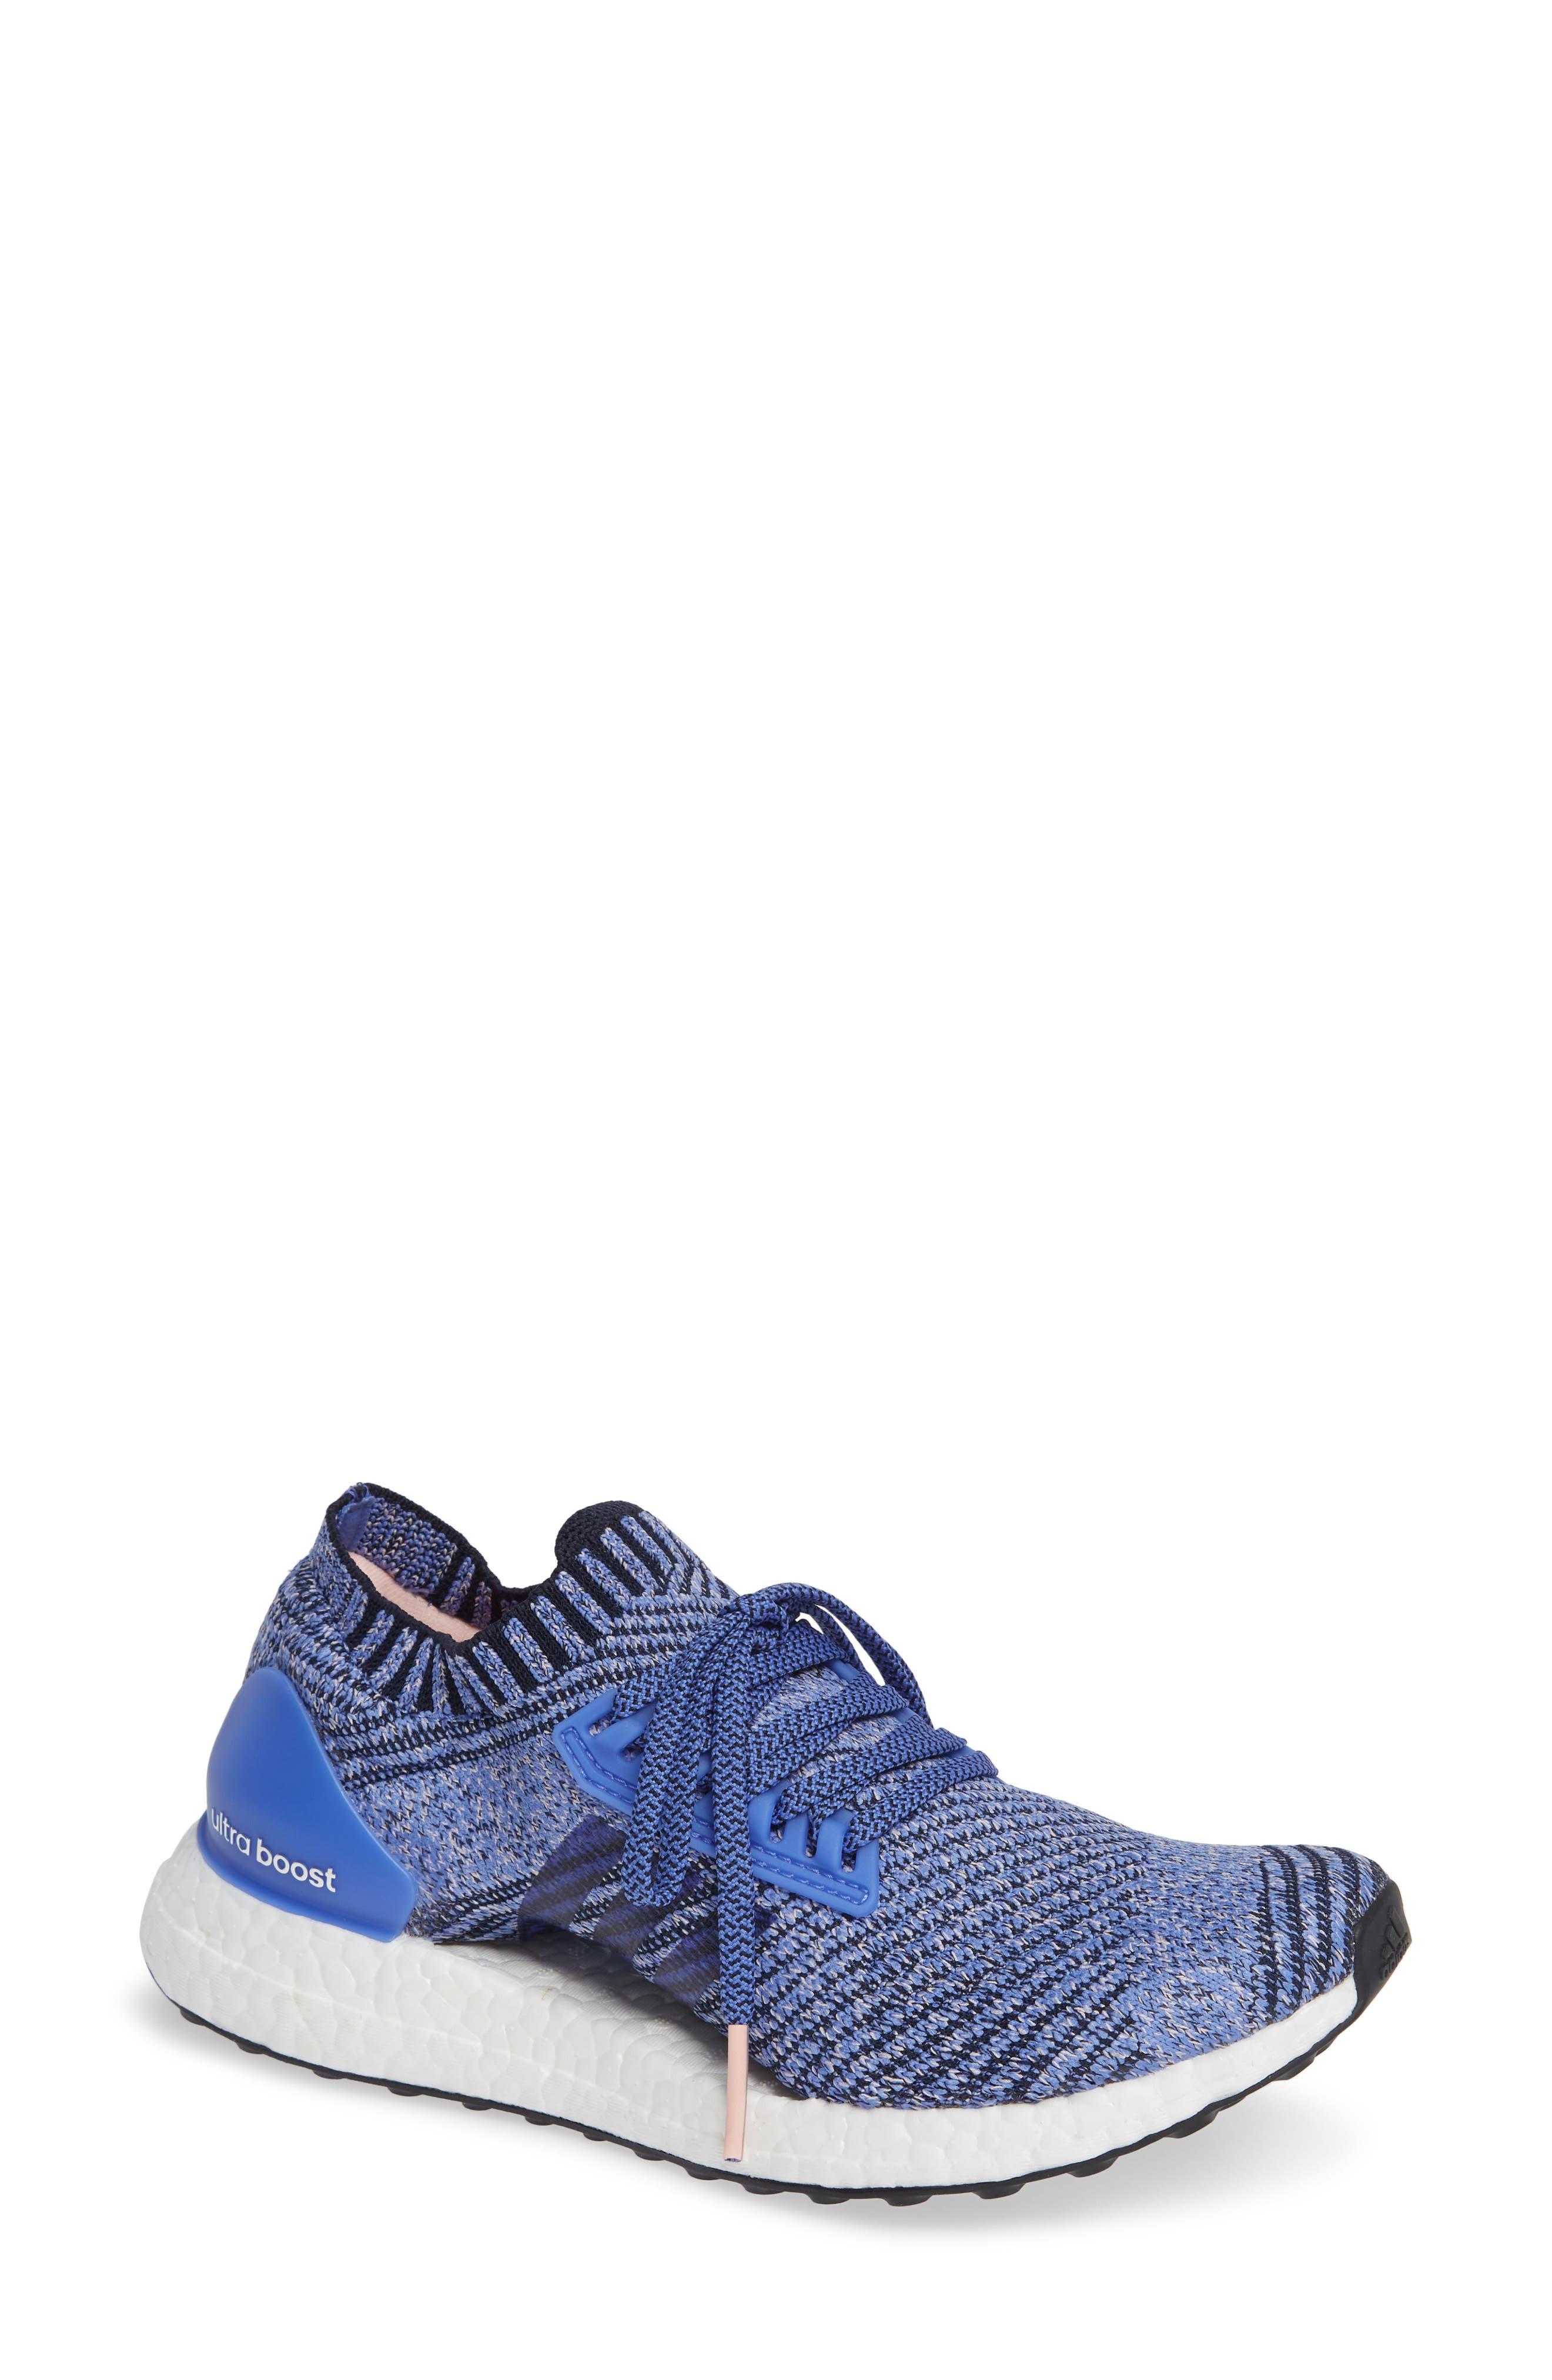 UltraBoost X Running Shoe,                         Main,                         color, REAL LILAC/ LEGEND INK/ BLACK